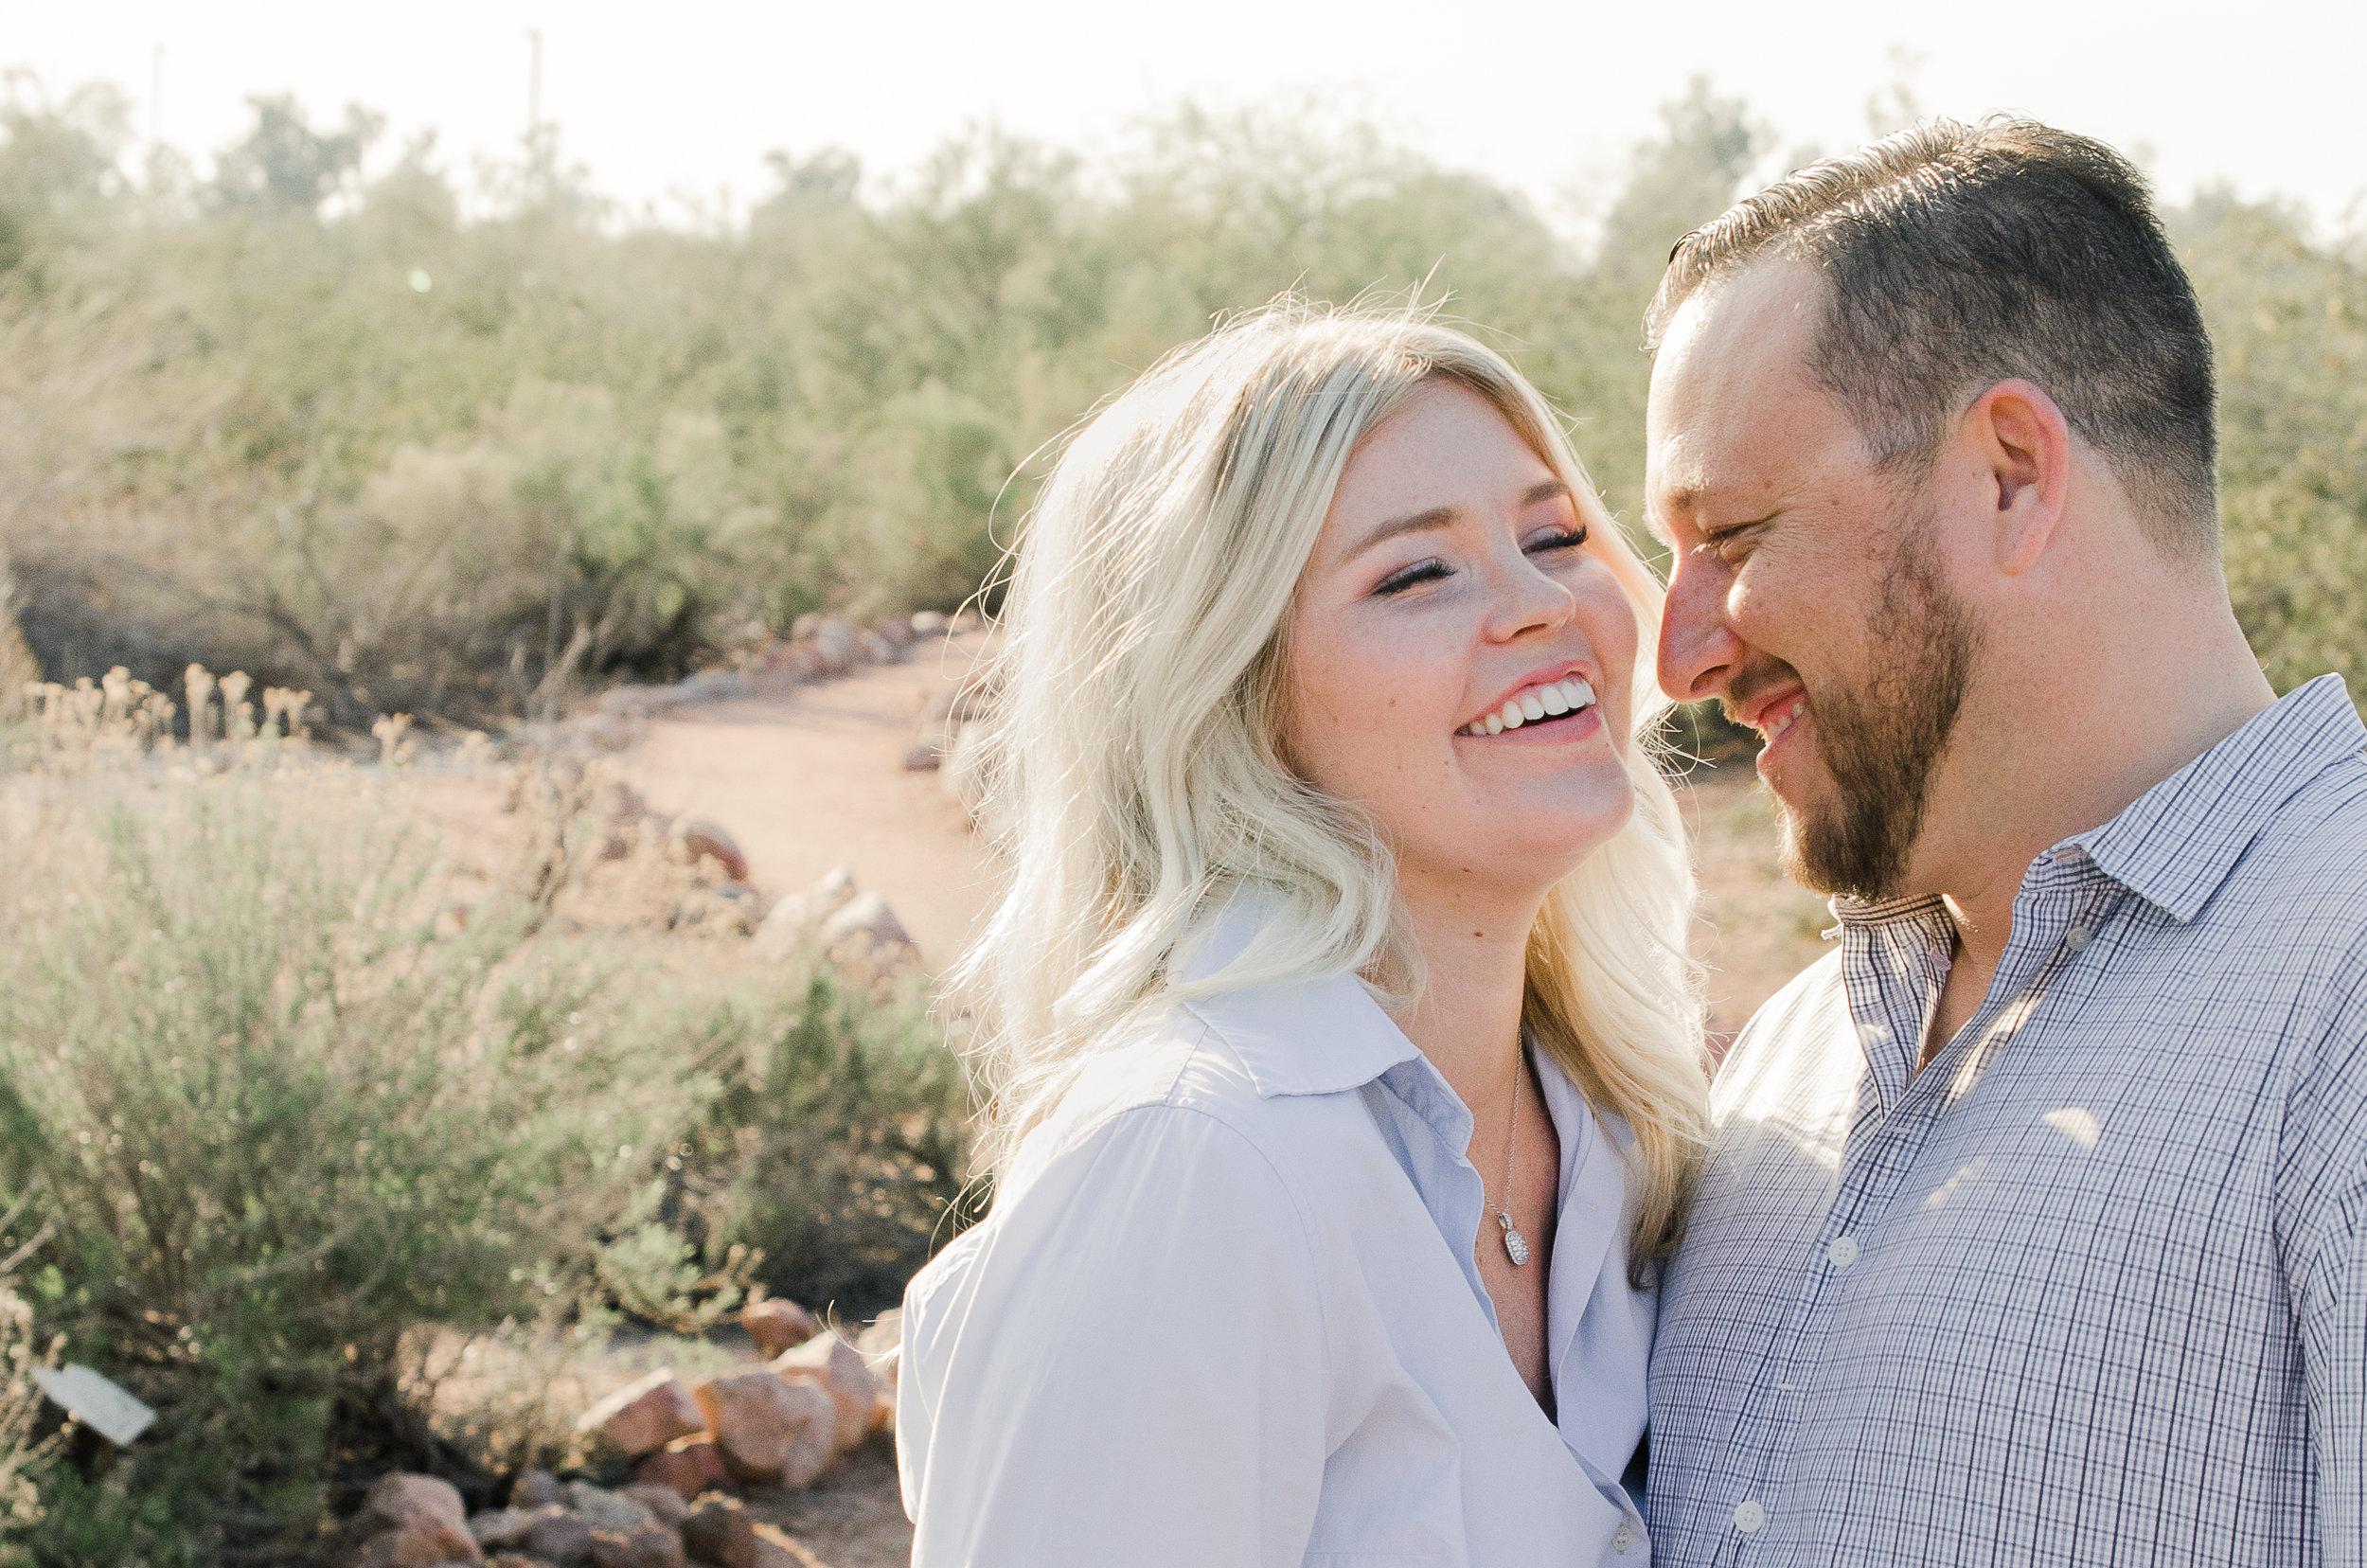 Scottsdale, AZ Family Session - Light & Airy Photographer